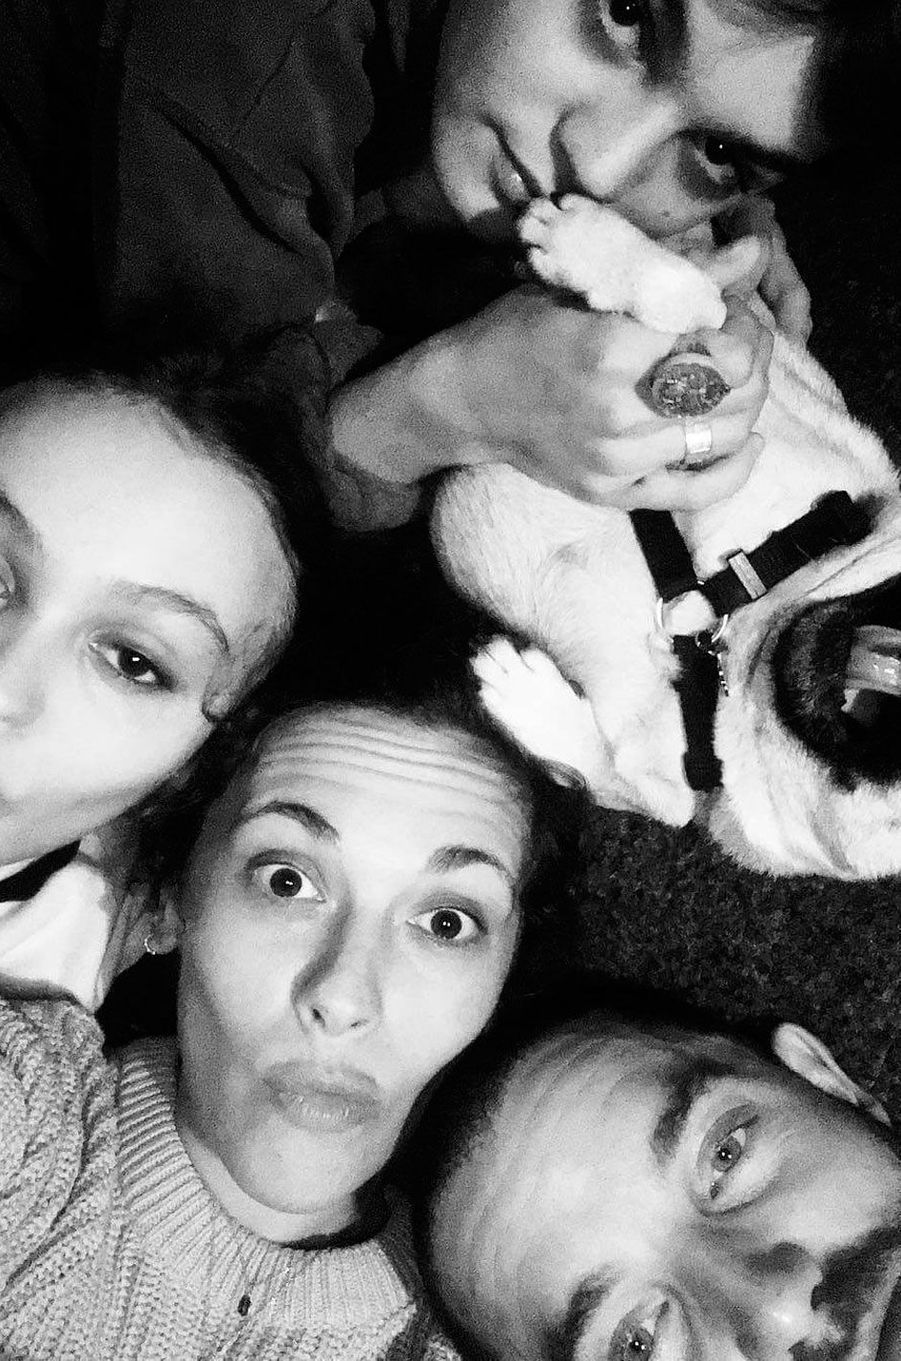 Lily-Rose Depp, Alison Paradis et Jack Depp